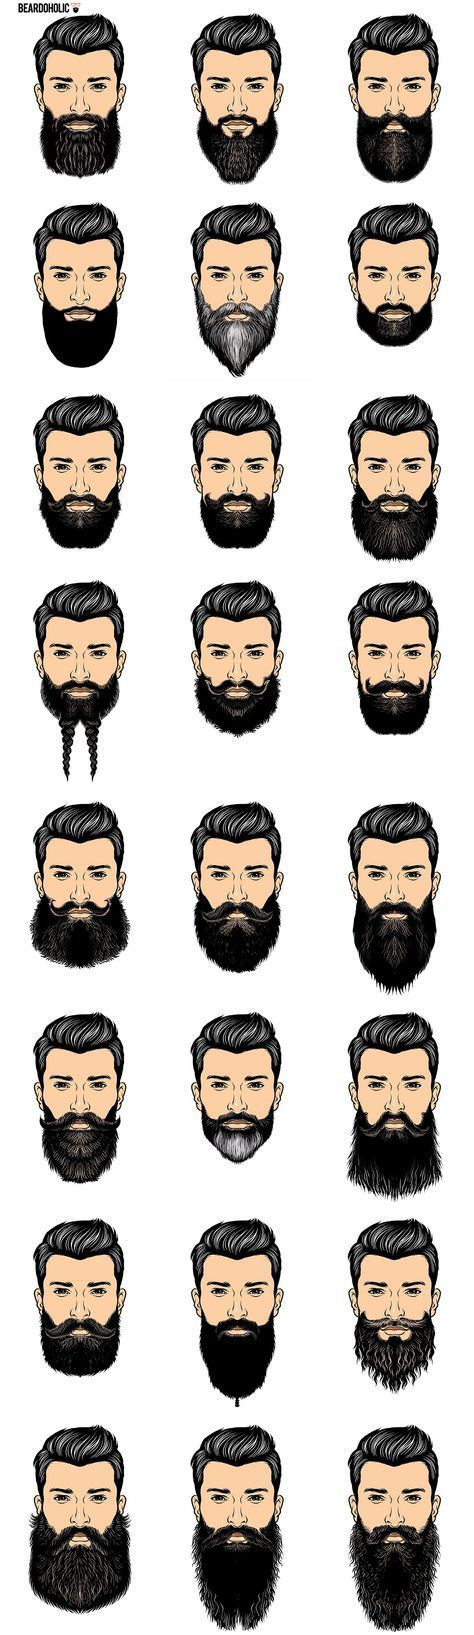 beardoholic.com wp-content uploads 2016 10 24-long-beard-styles.jpg